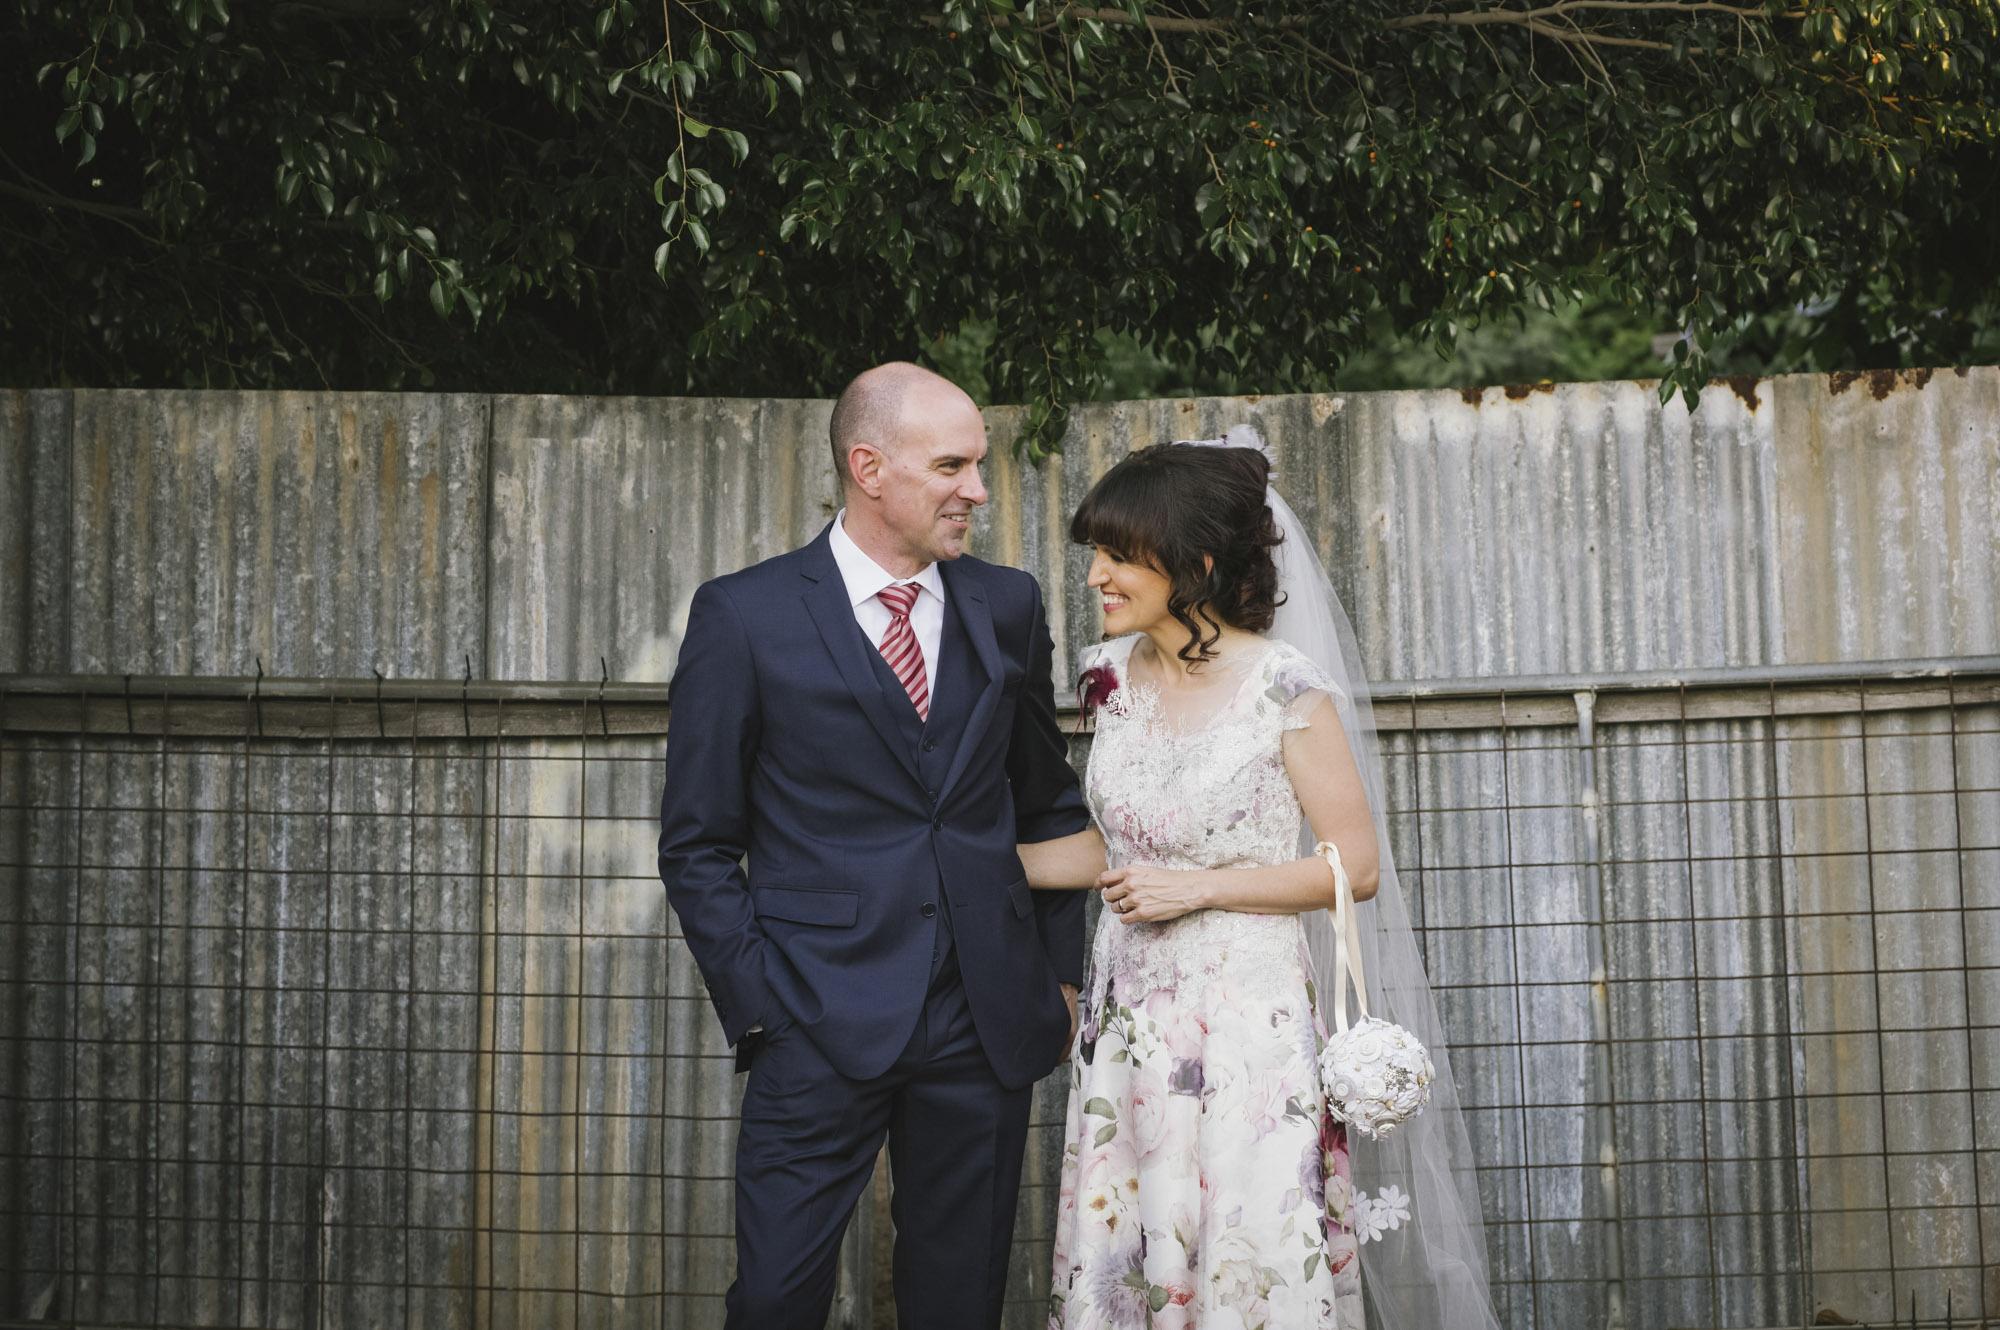 Angie-Roe-Photography-Wedding-Perth-Northam-Wheatbelt-Country-Rural (50).jpg